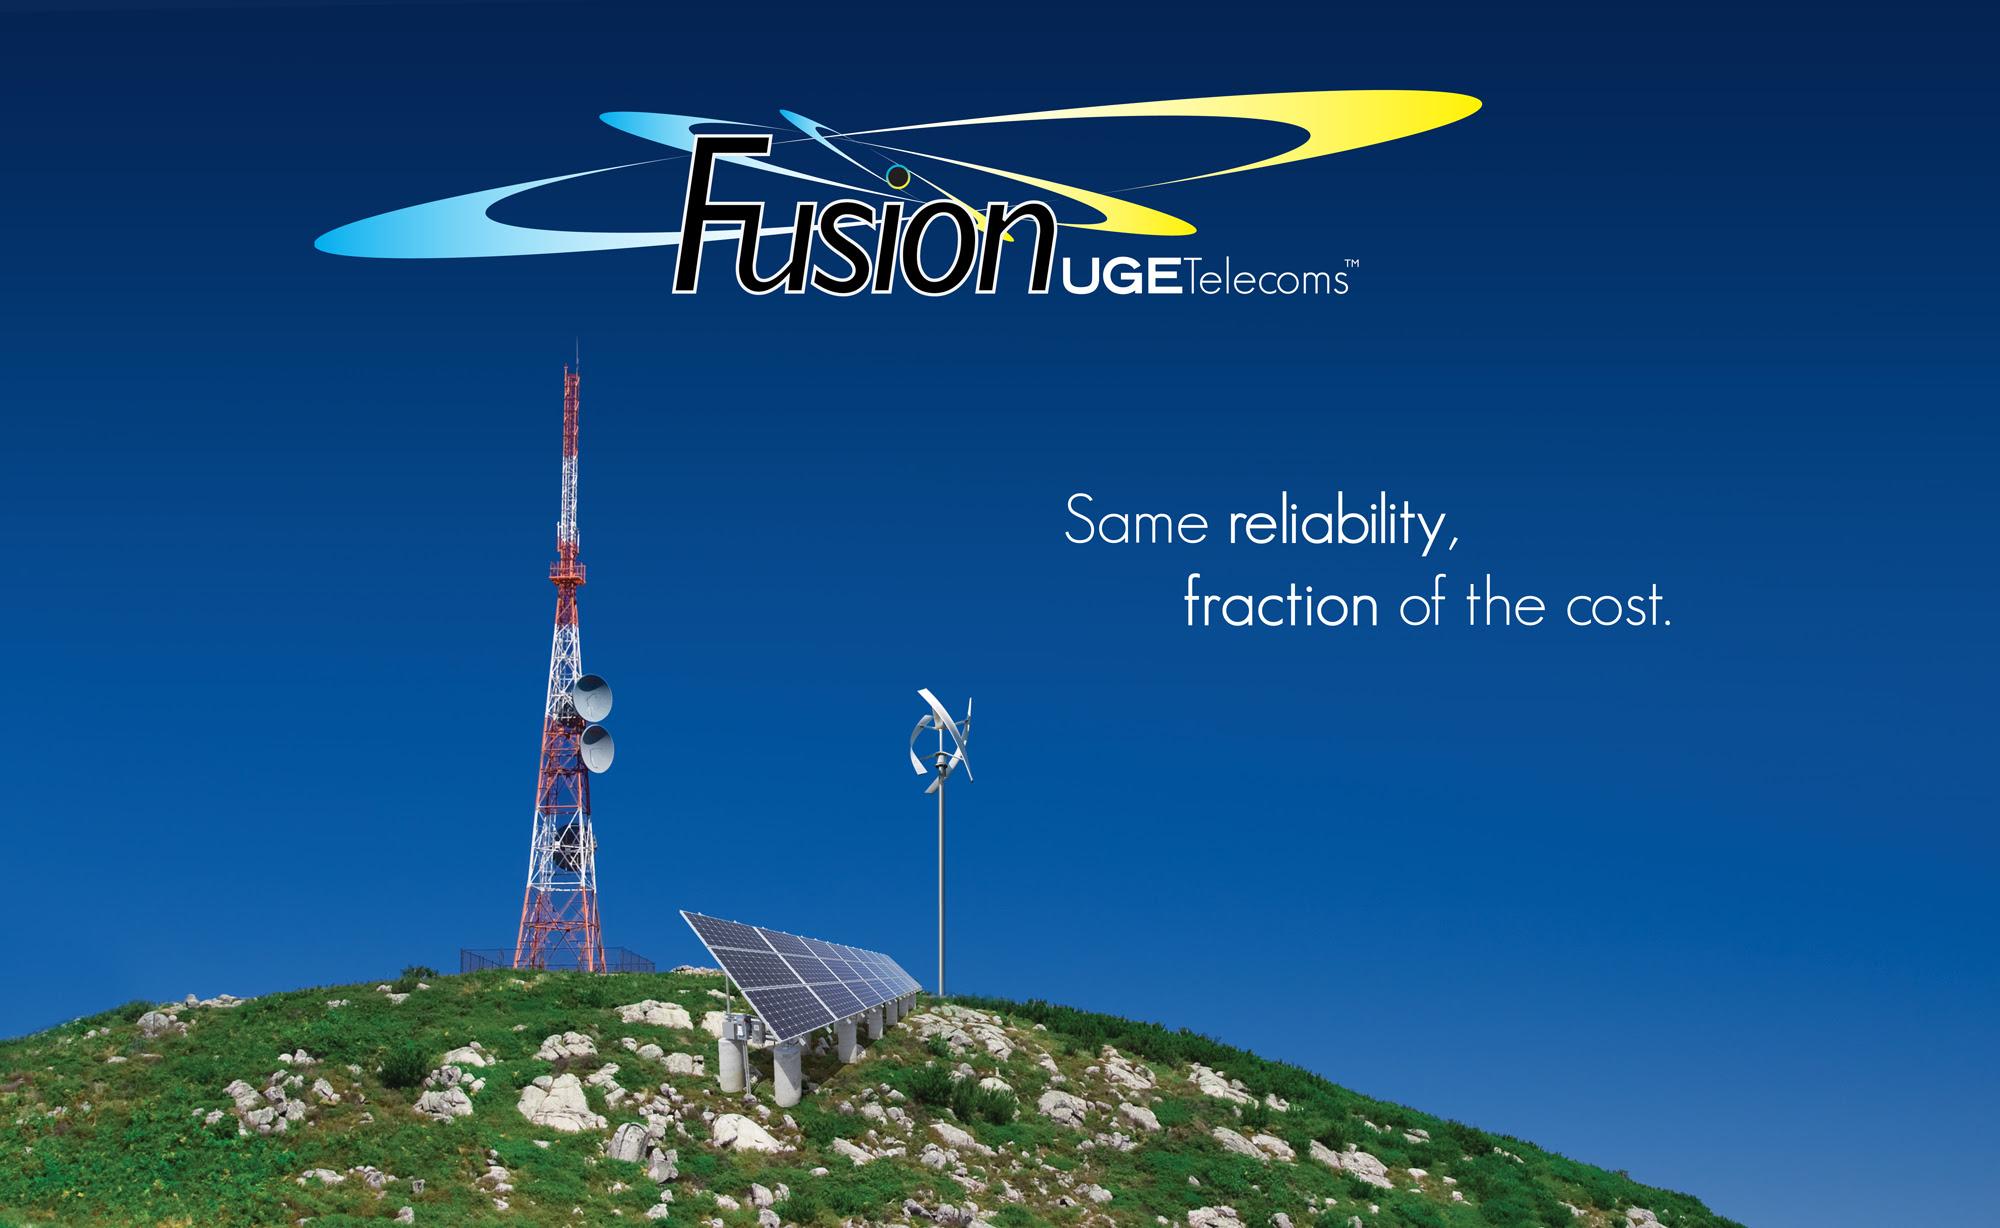 http://ww1.prweb.com/prfiles/2012/02/17/9209222/UGE%20Telecom%20FUSION%20wind%20and%20solar%20system.jpg